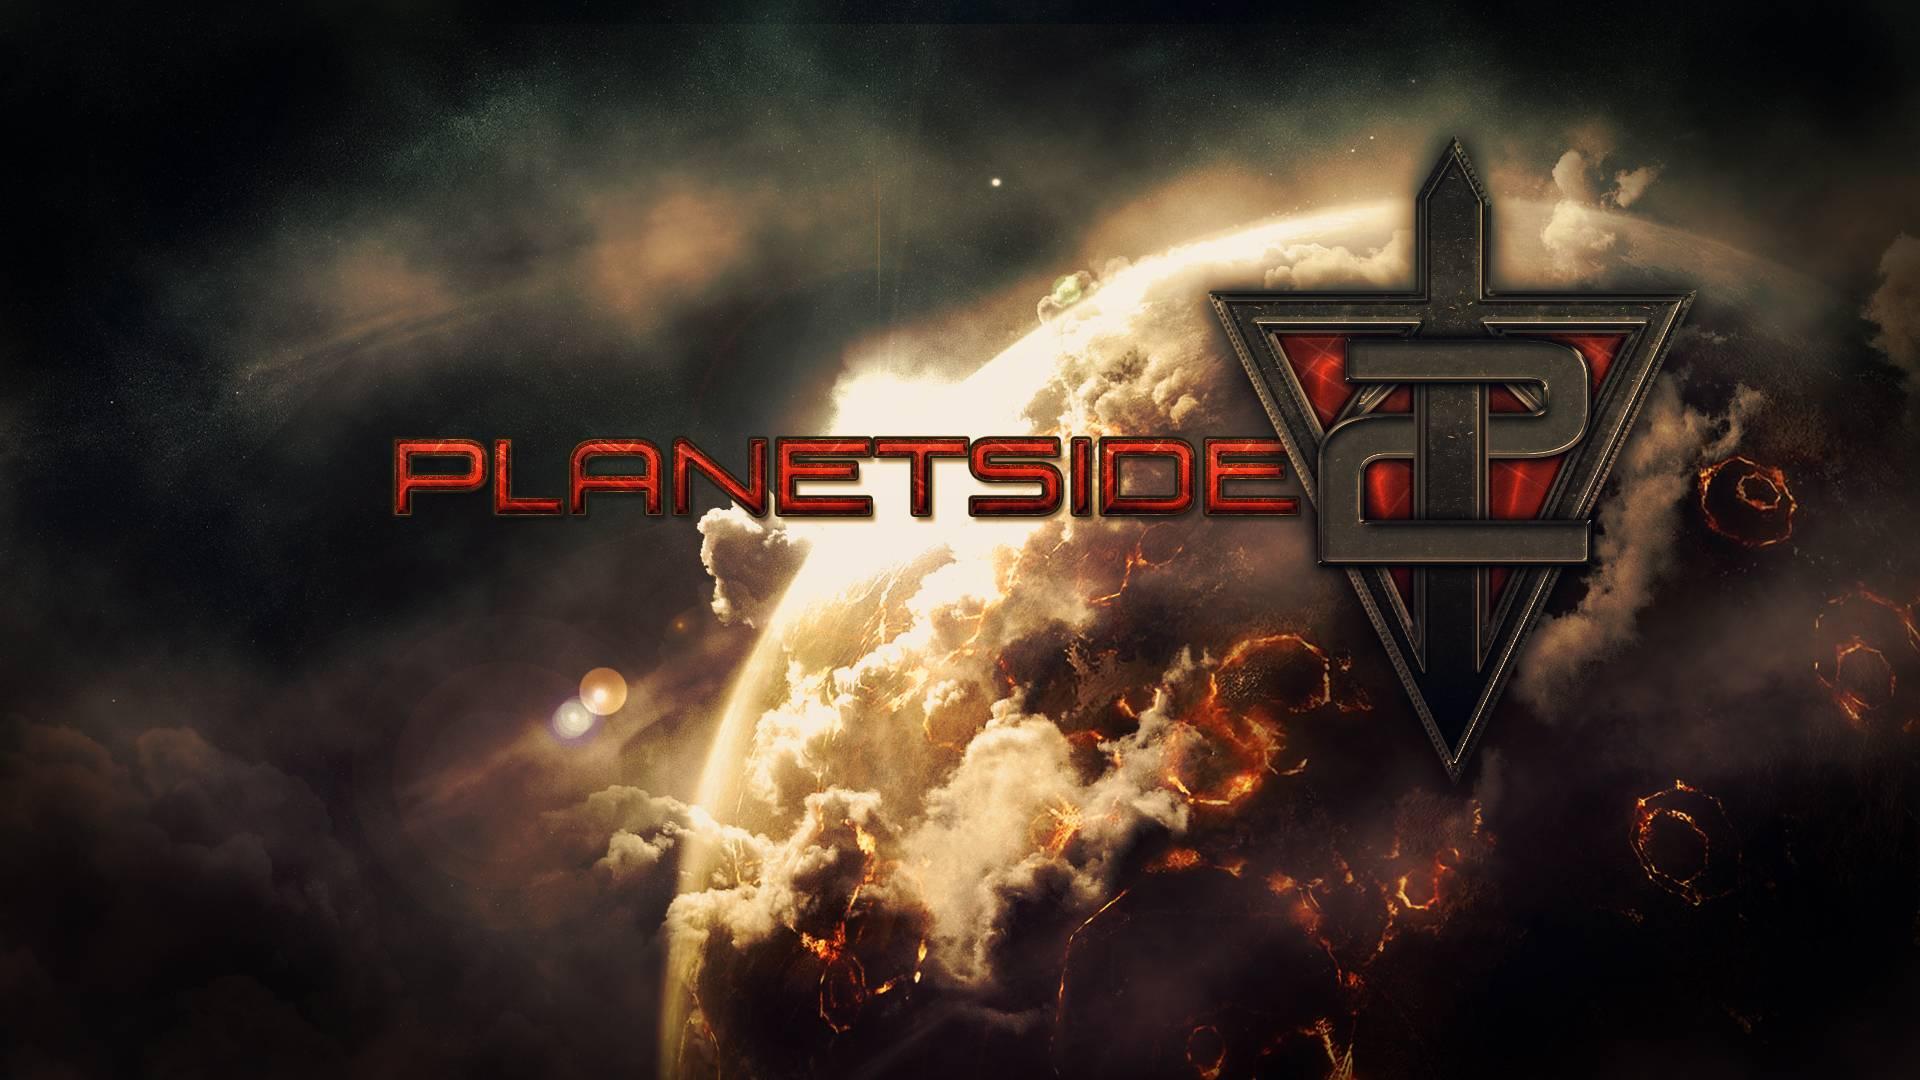 Planetside 2 hd wallpaper 1920x1080 25758 1920x1080